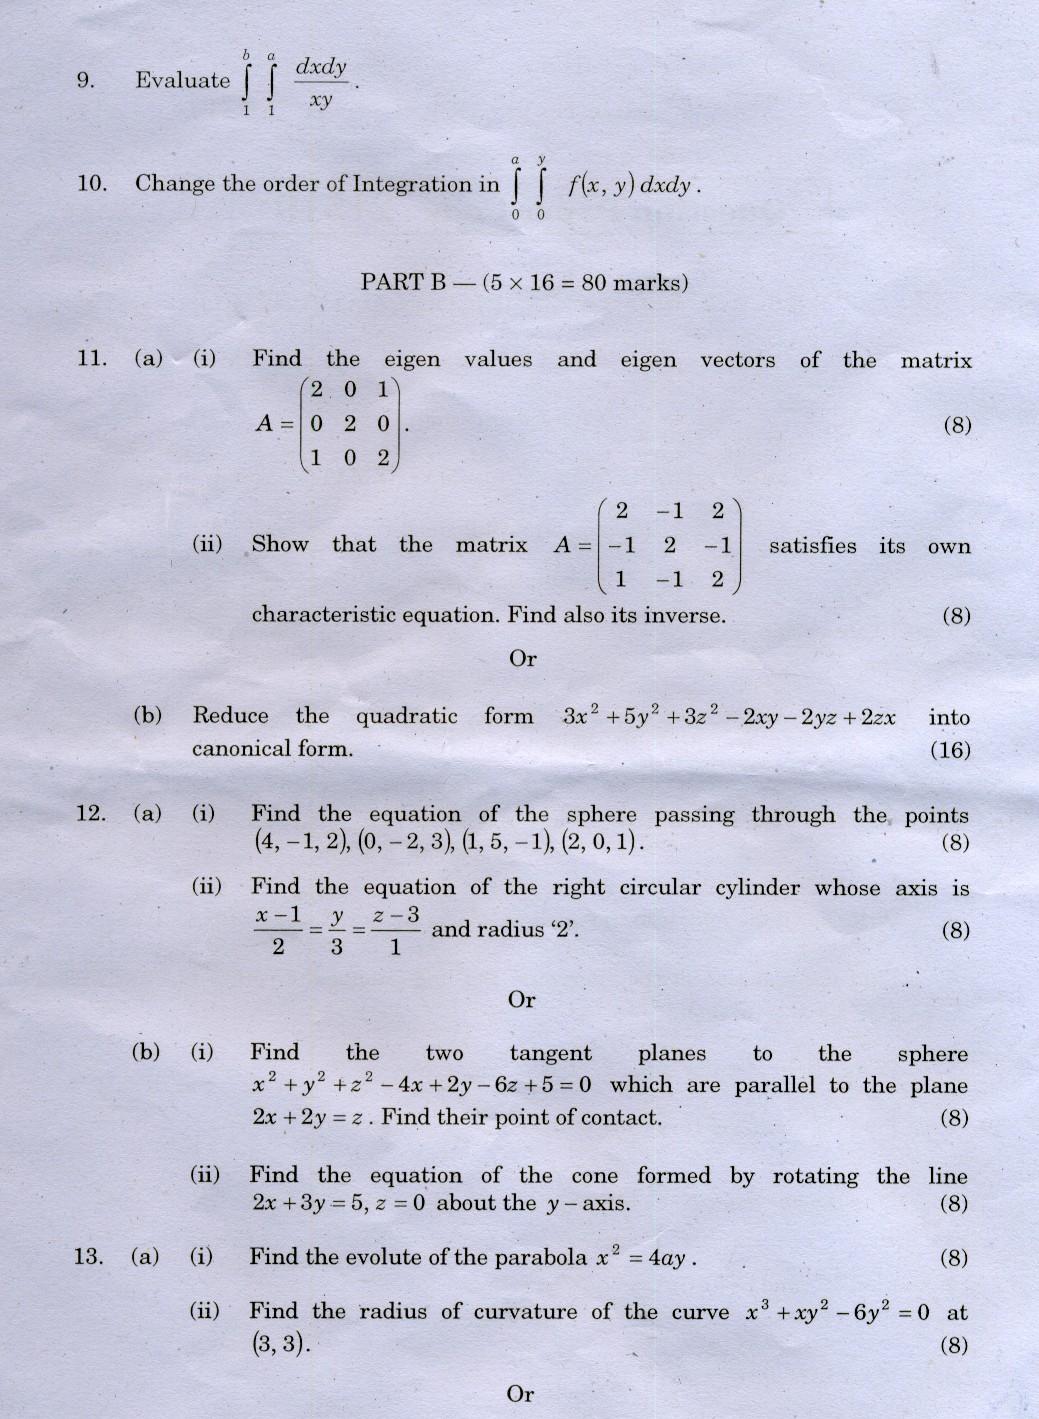 MA2111 SYLLABUS PDF